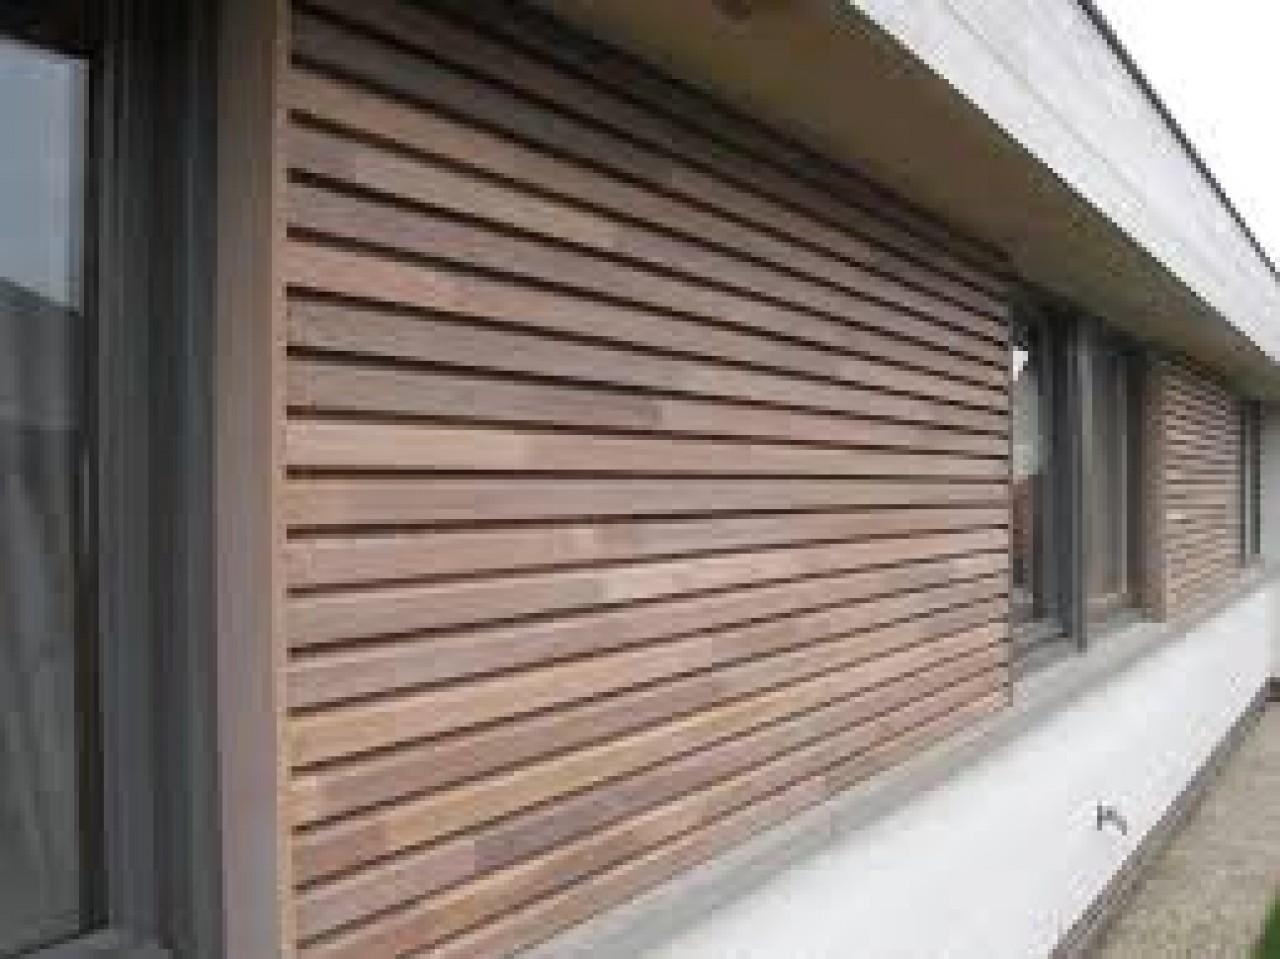 Onze producten planchetten - Interieur gevelbekleding houten ...